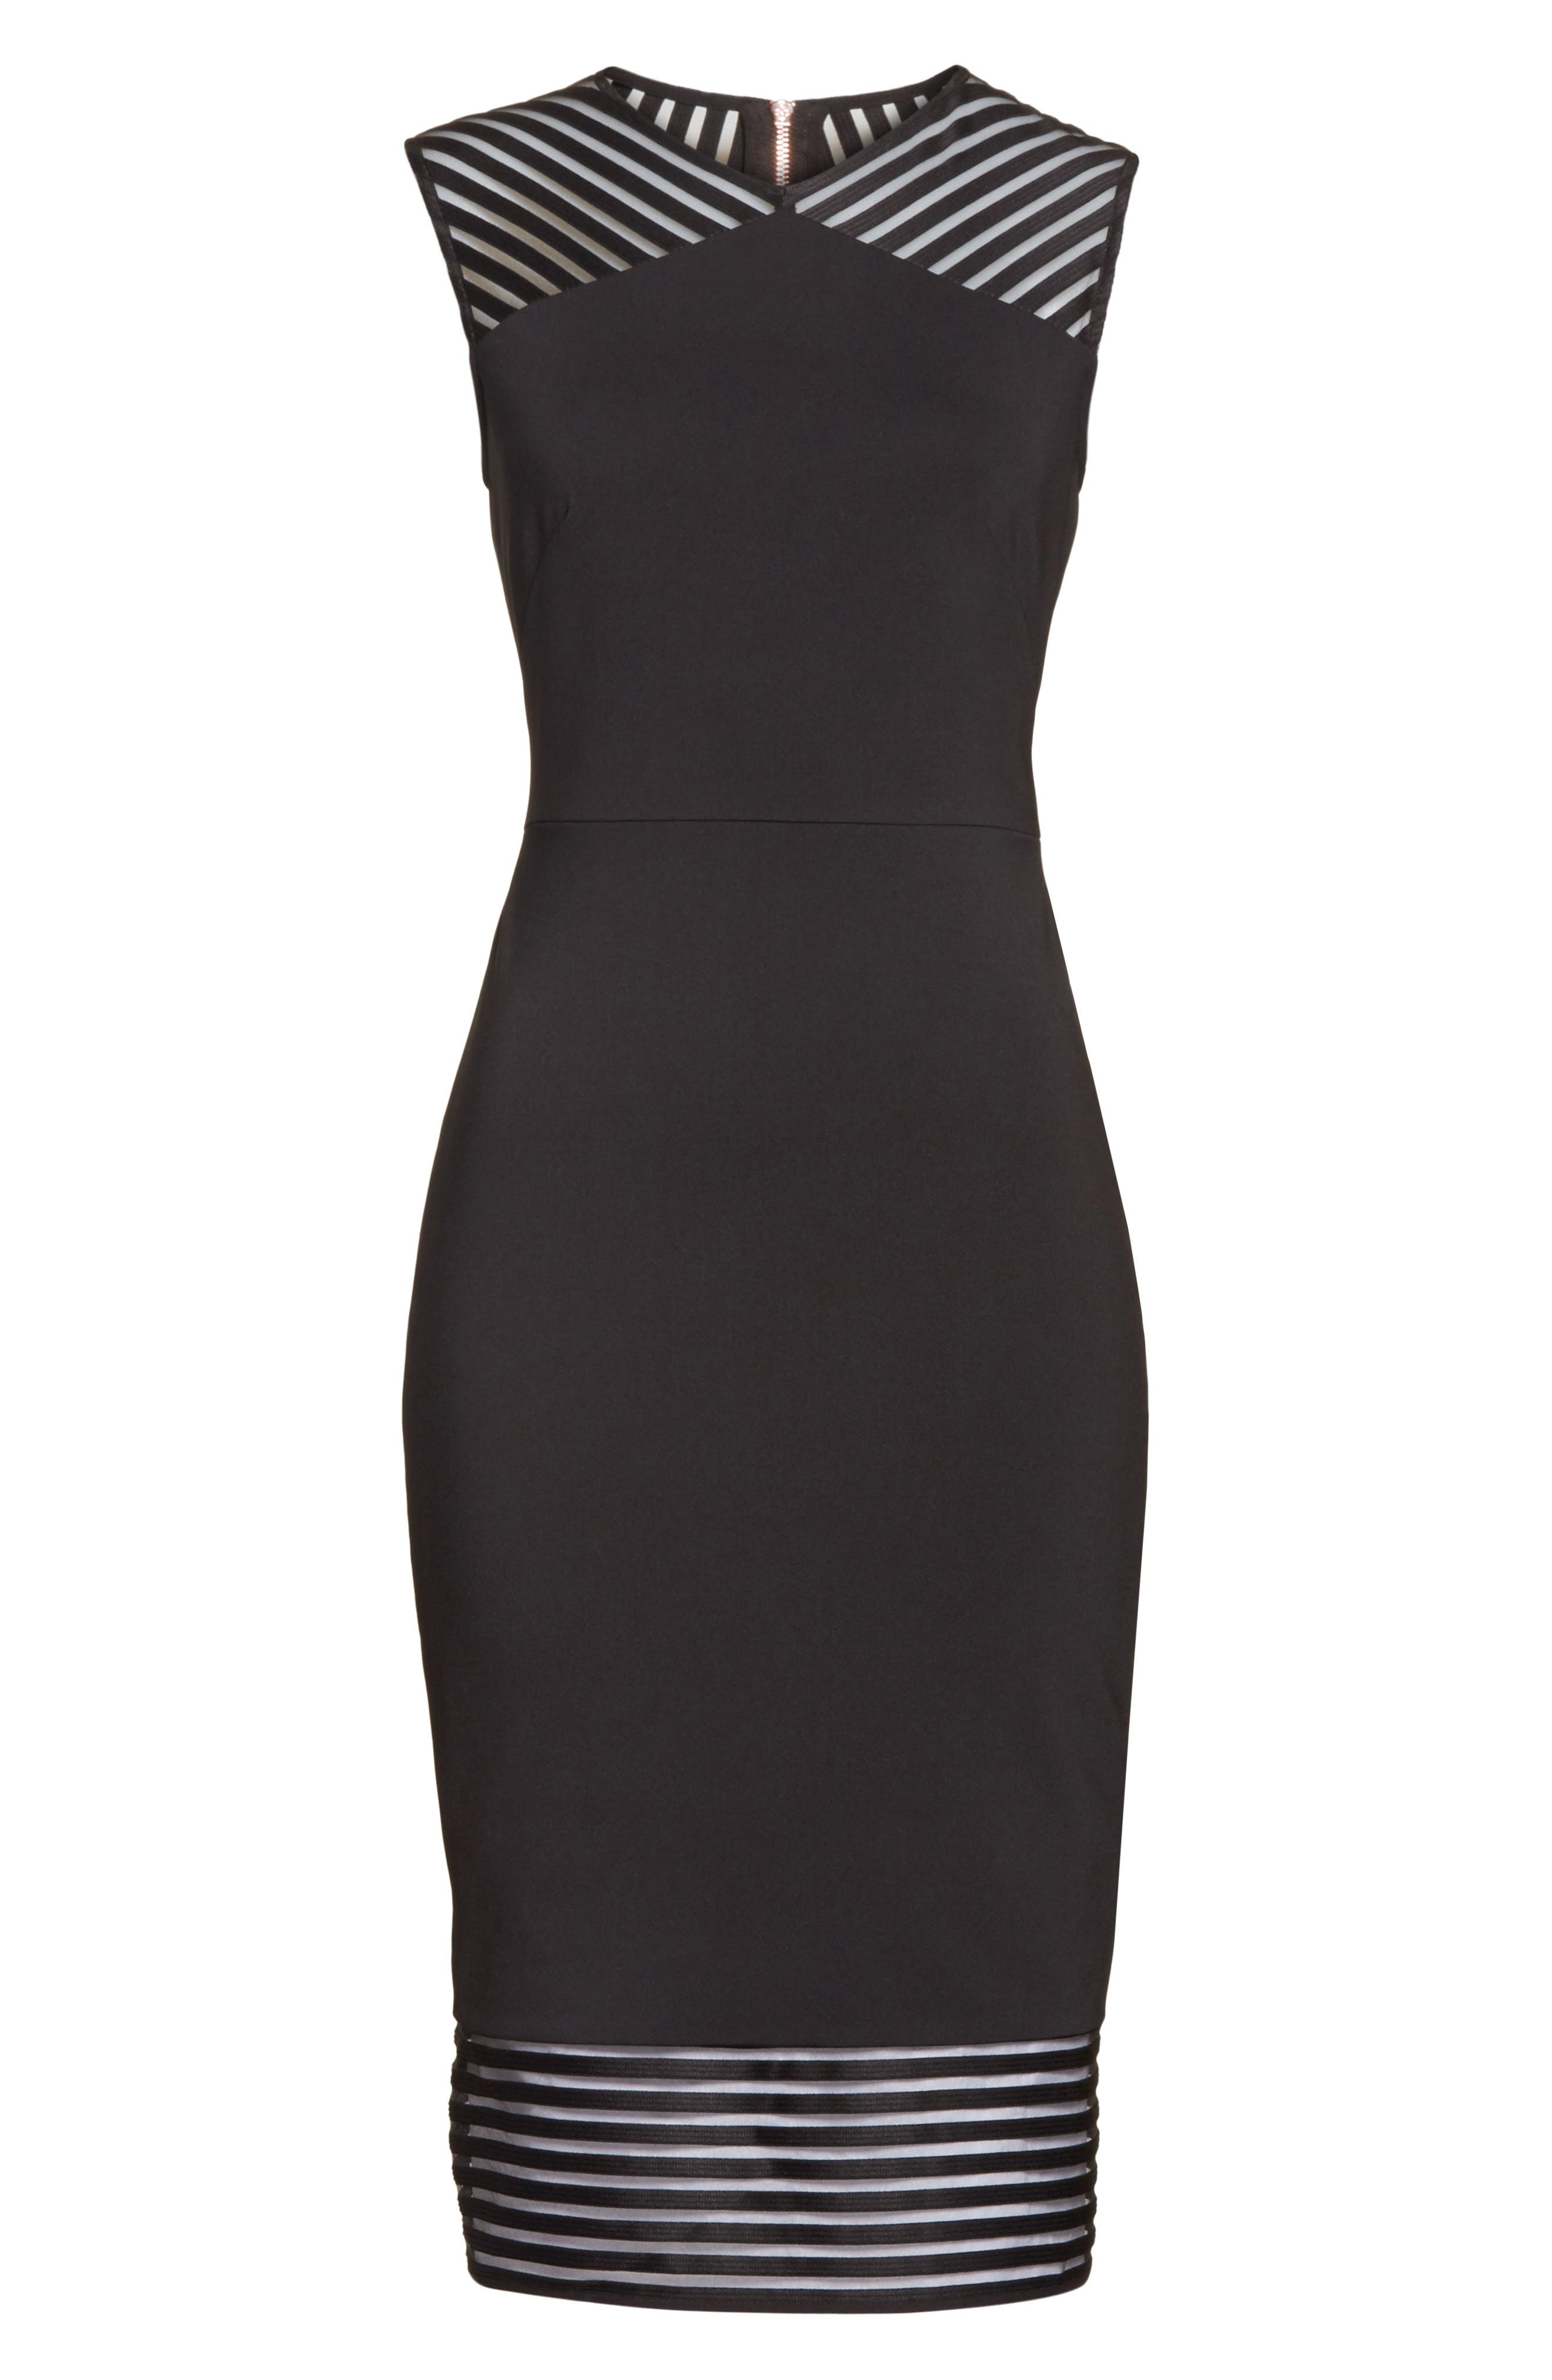 TED BAKER LONDON,                             Lucette Mesh Detail Body Con Dress,                             Alternate thumbnail 6, color,                             001